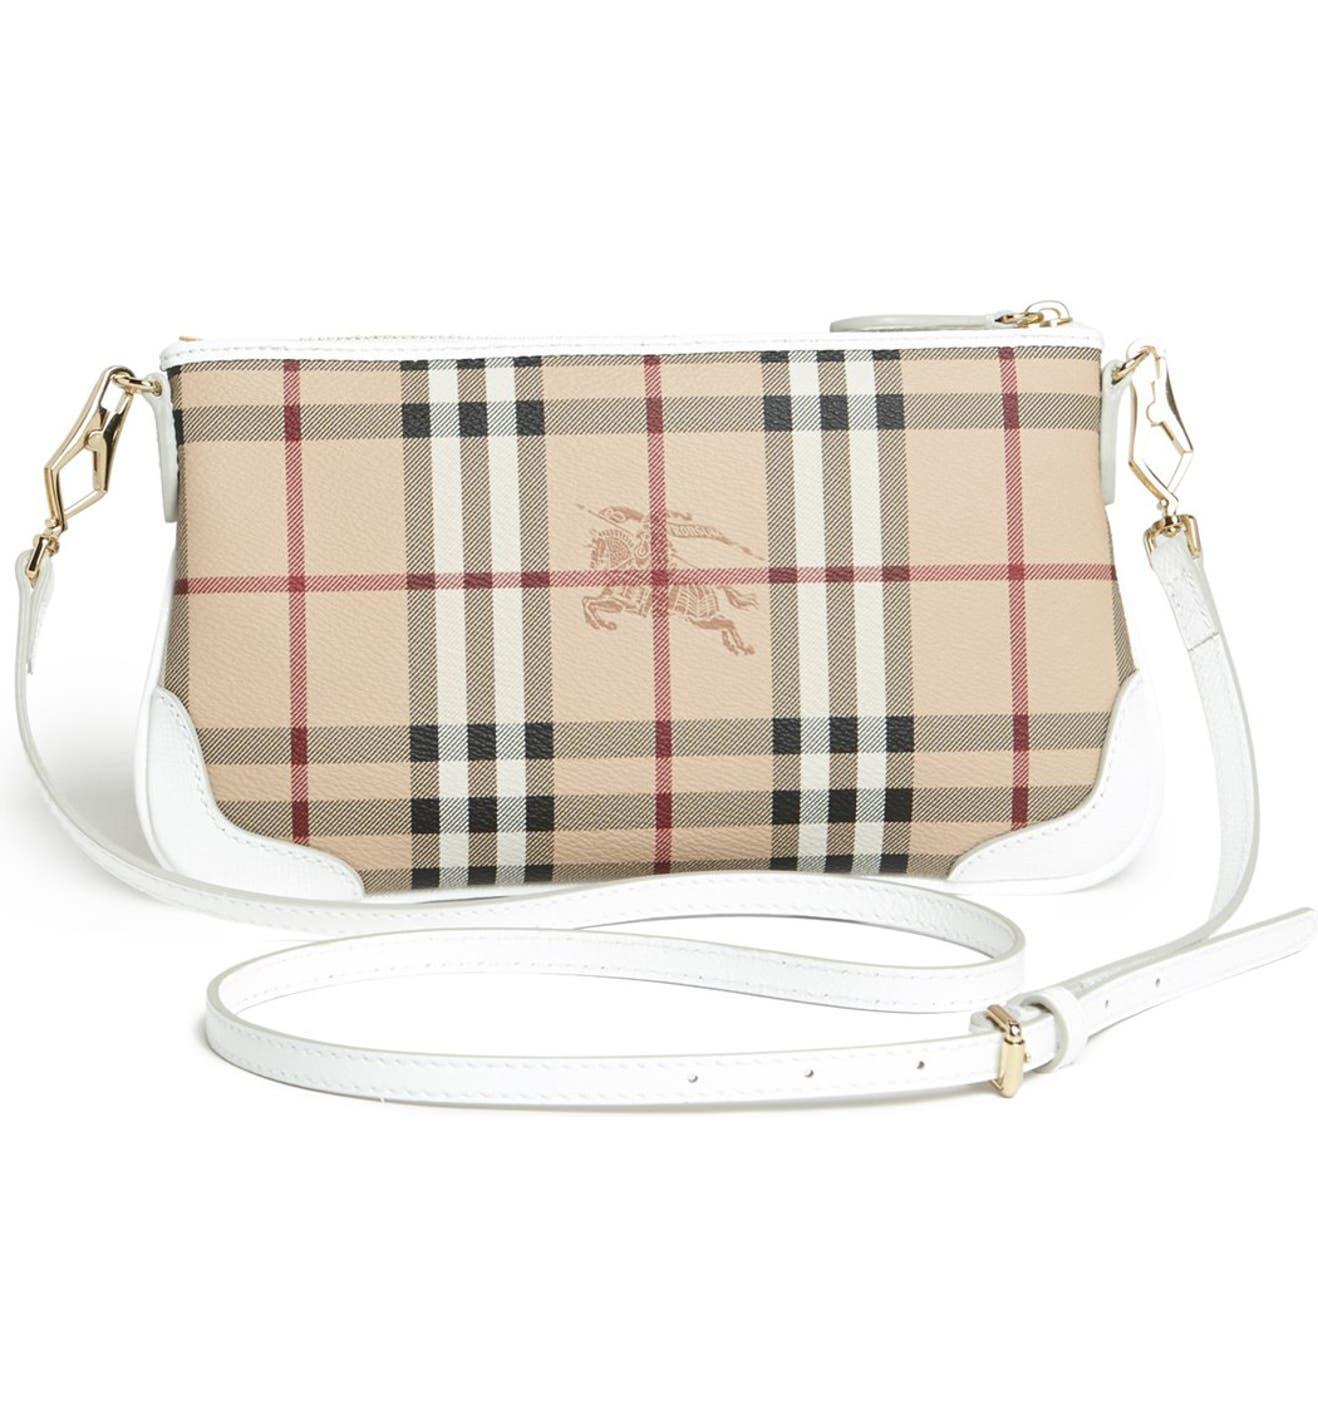 74474bfc1a23 Burberry  Peyton - Haymarket Check  Crossbody Bag